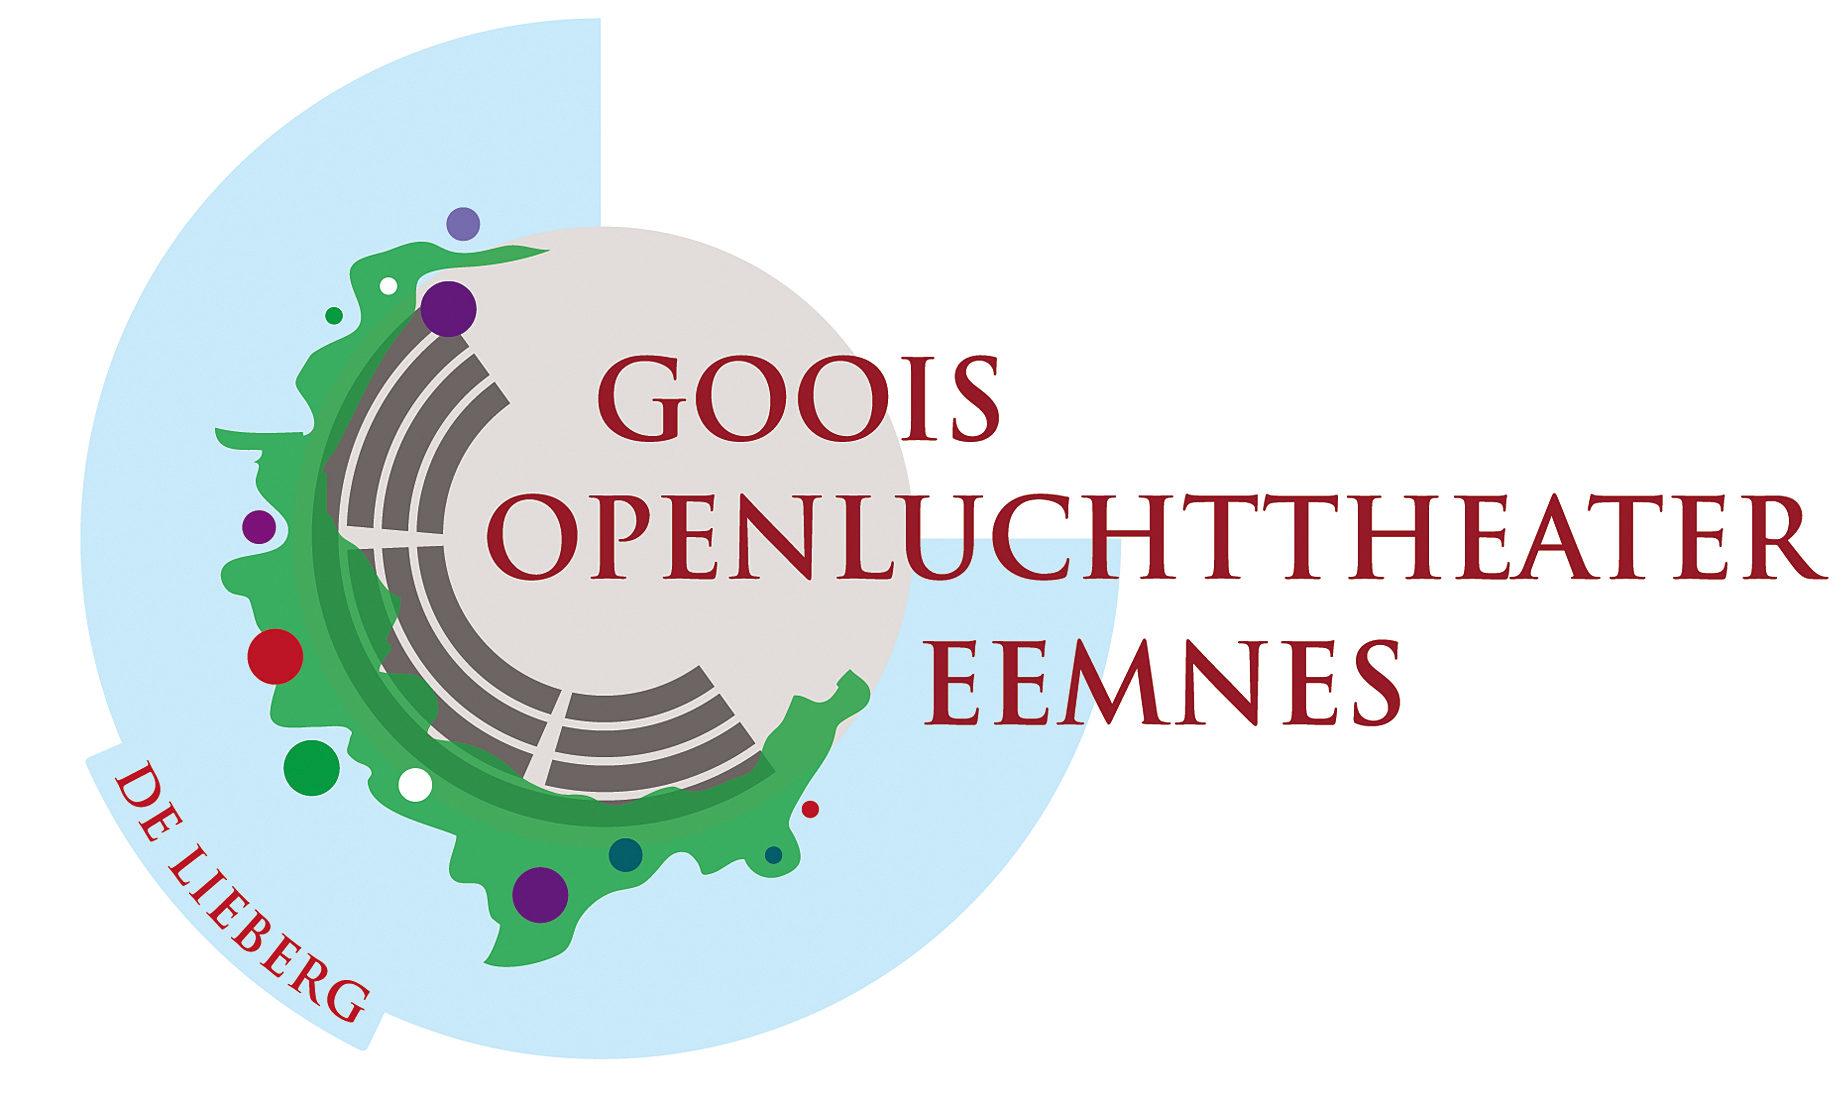 Goois-openluchttheater